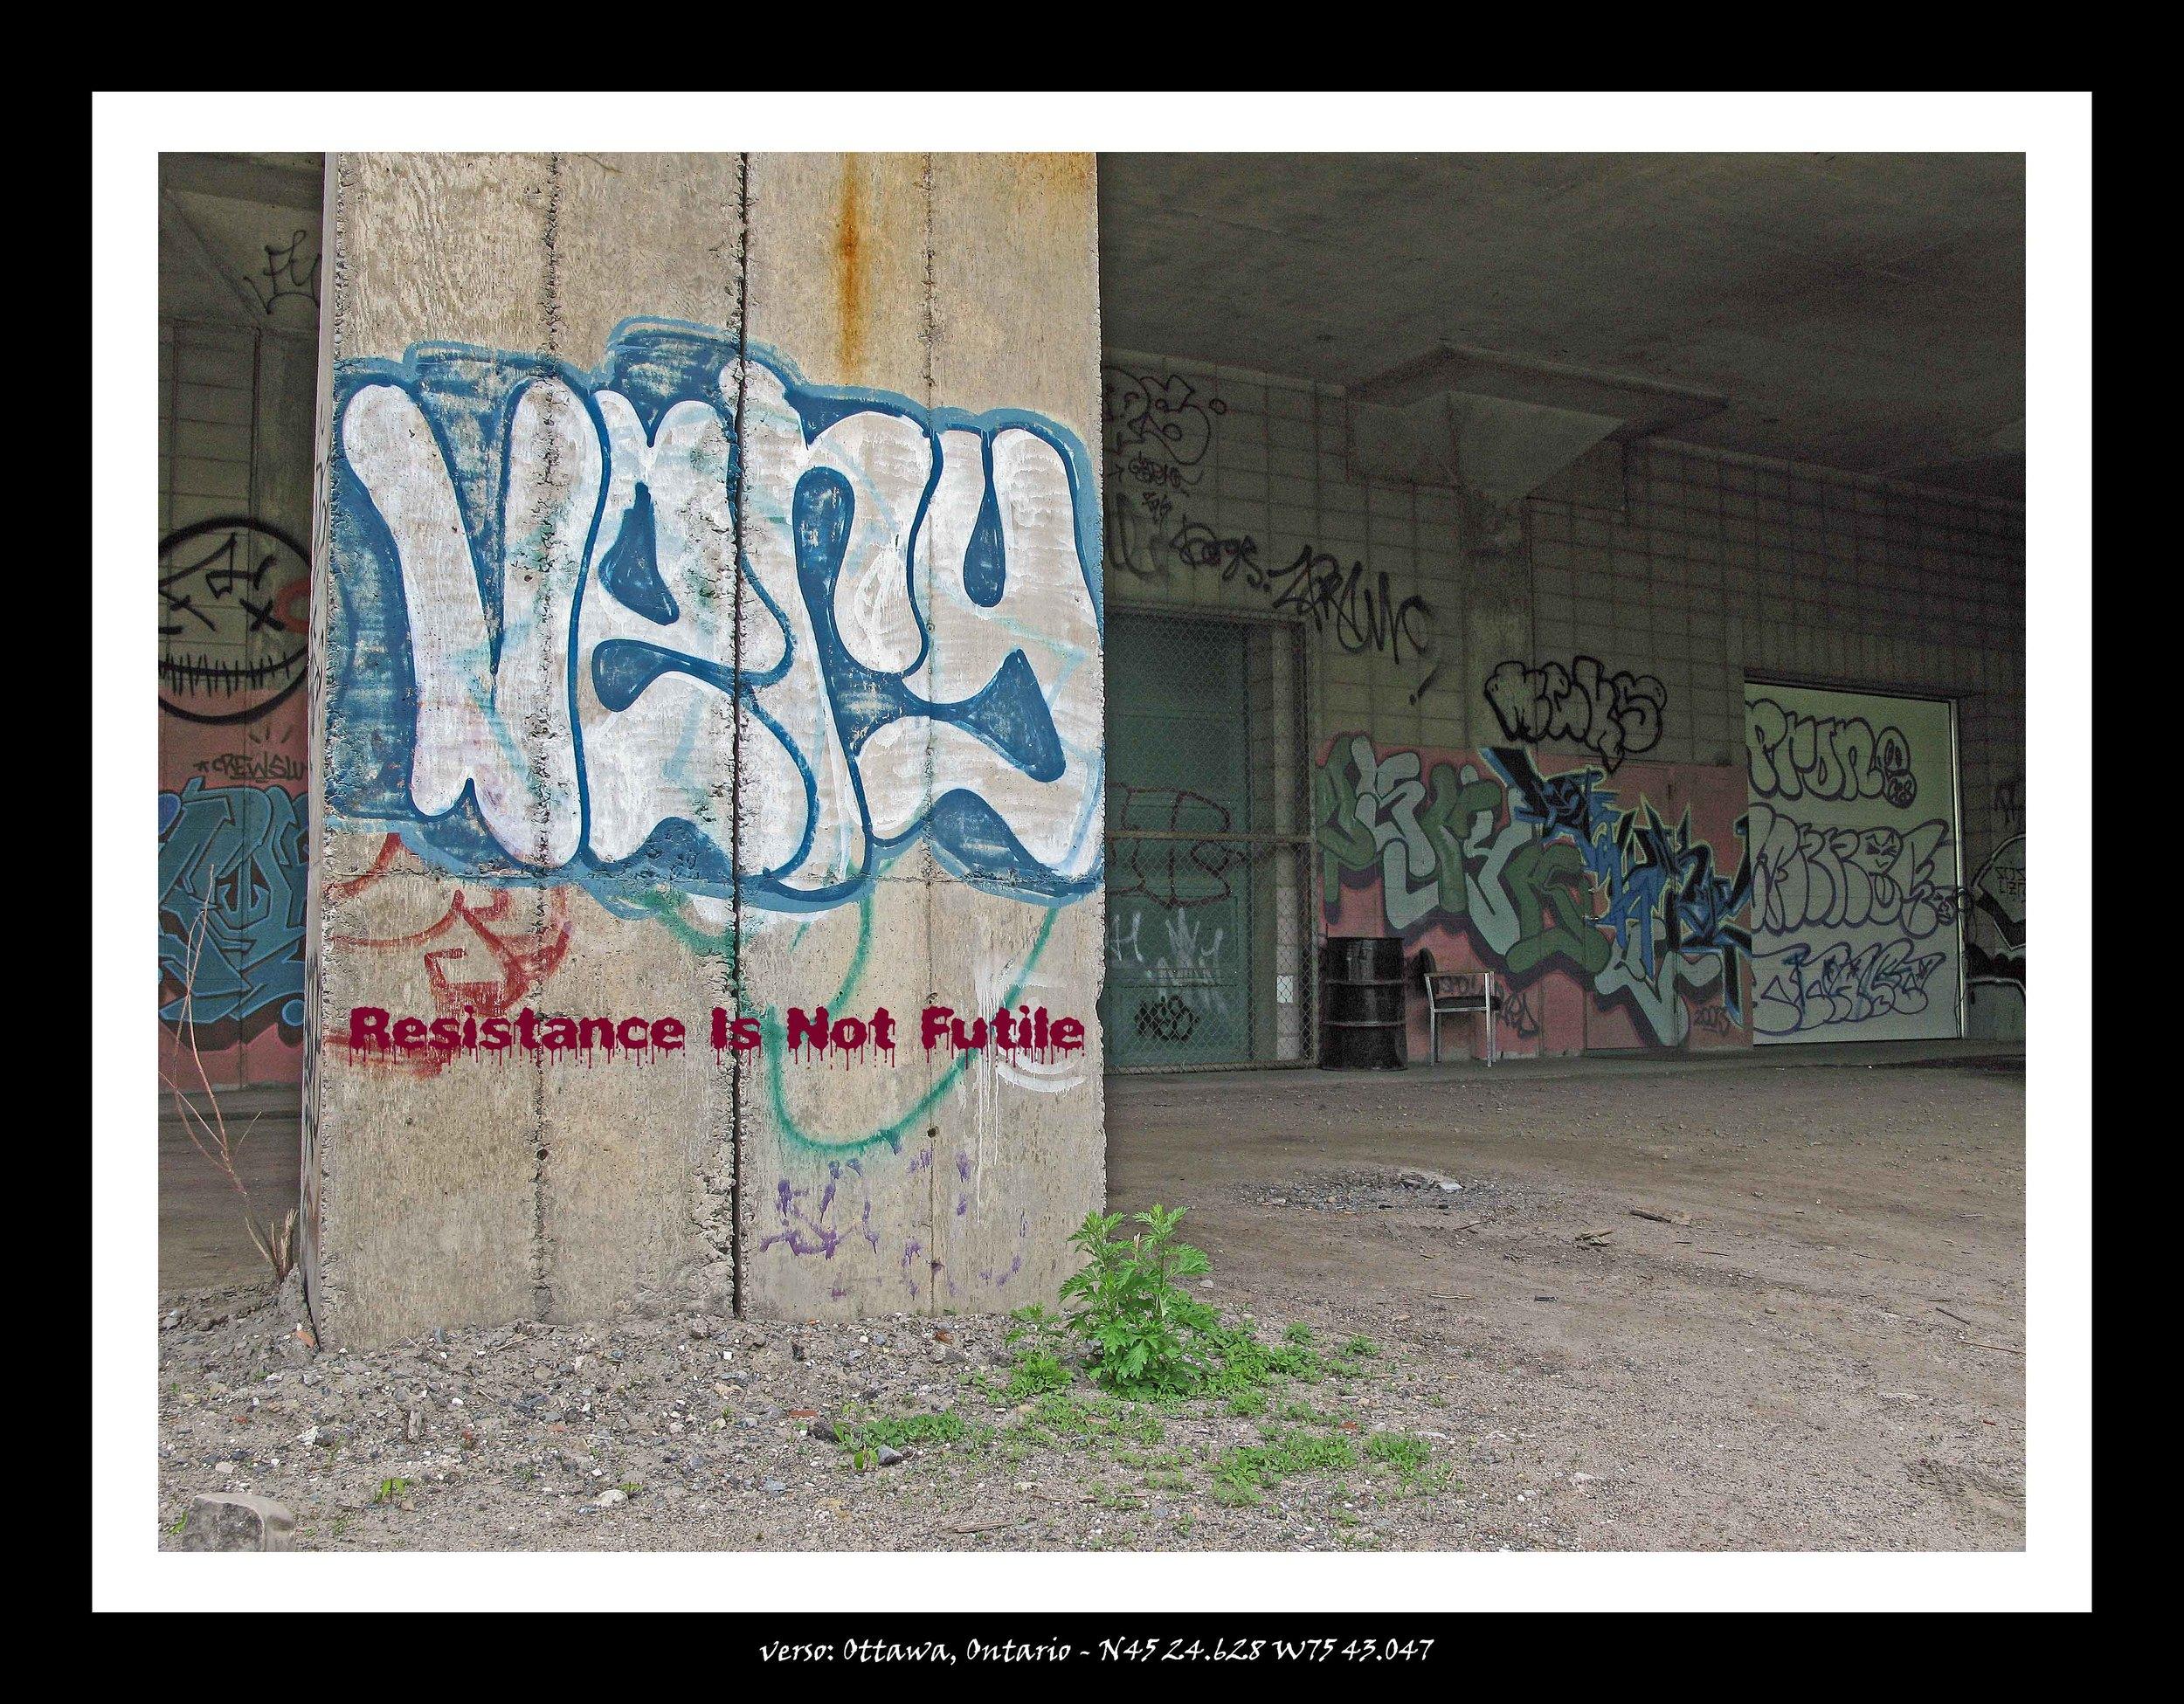 Graffito_Ottawa, Ontario, driveby .jpg